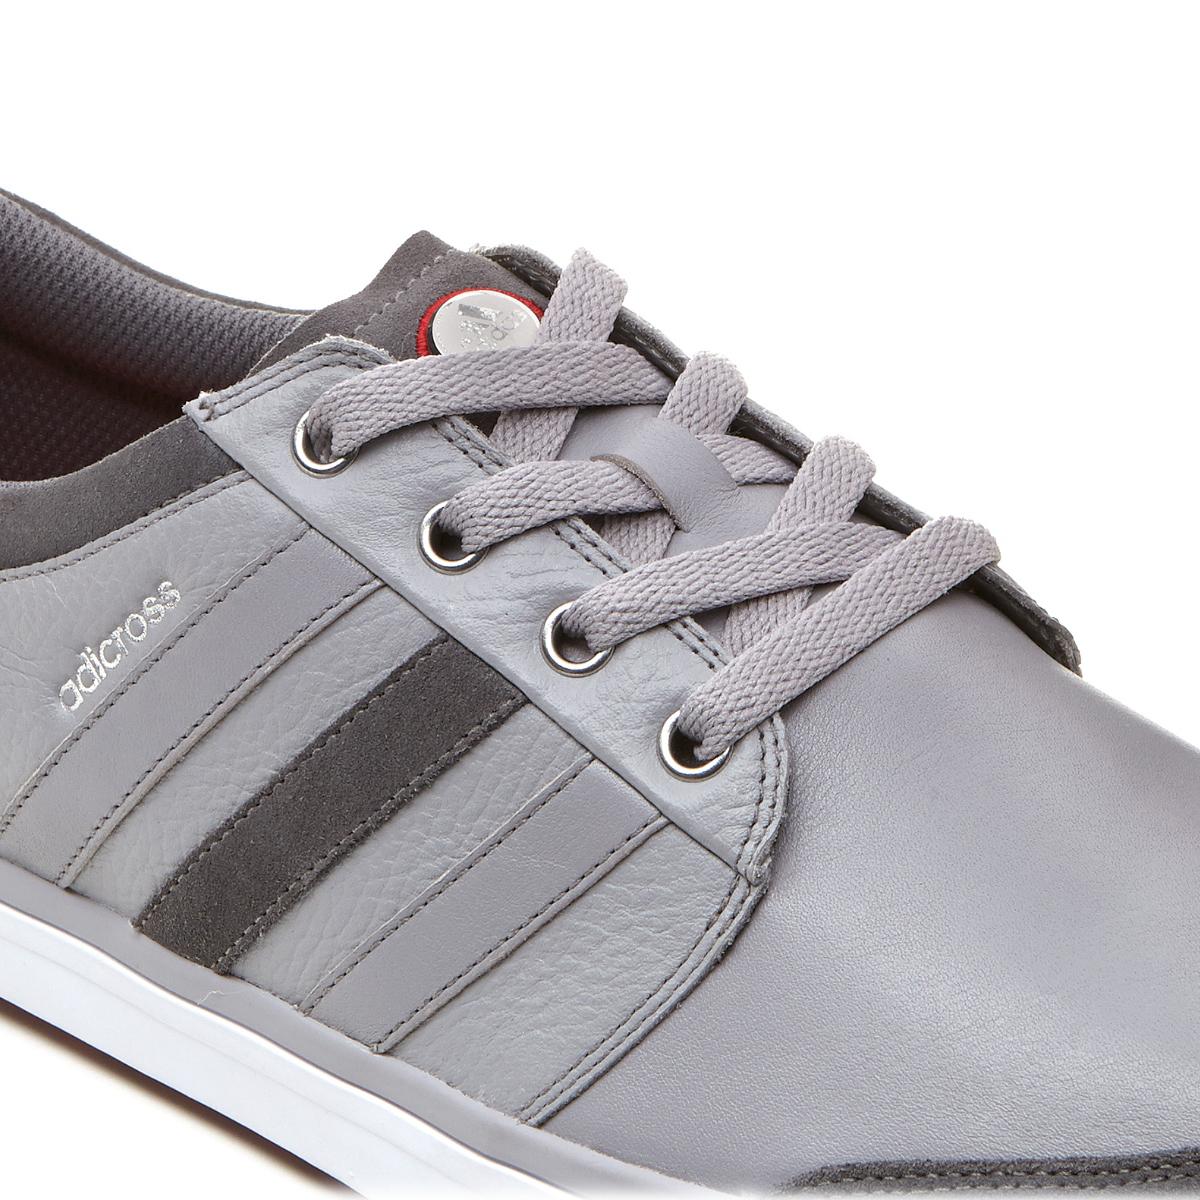 Chaussures adidas Golf Adicross Gripmore sans crampons